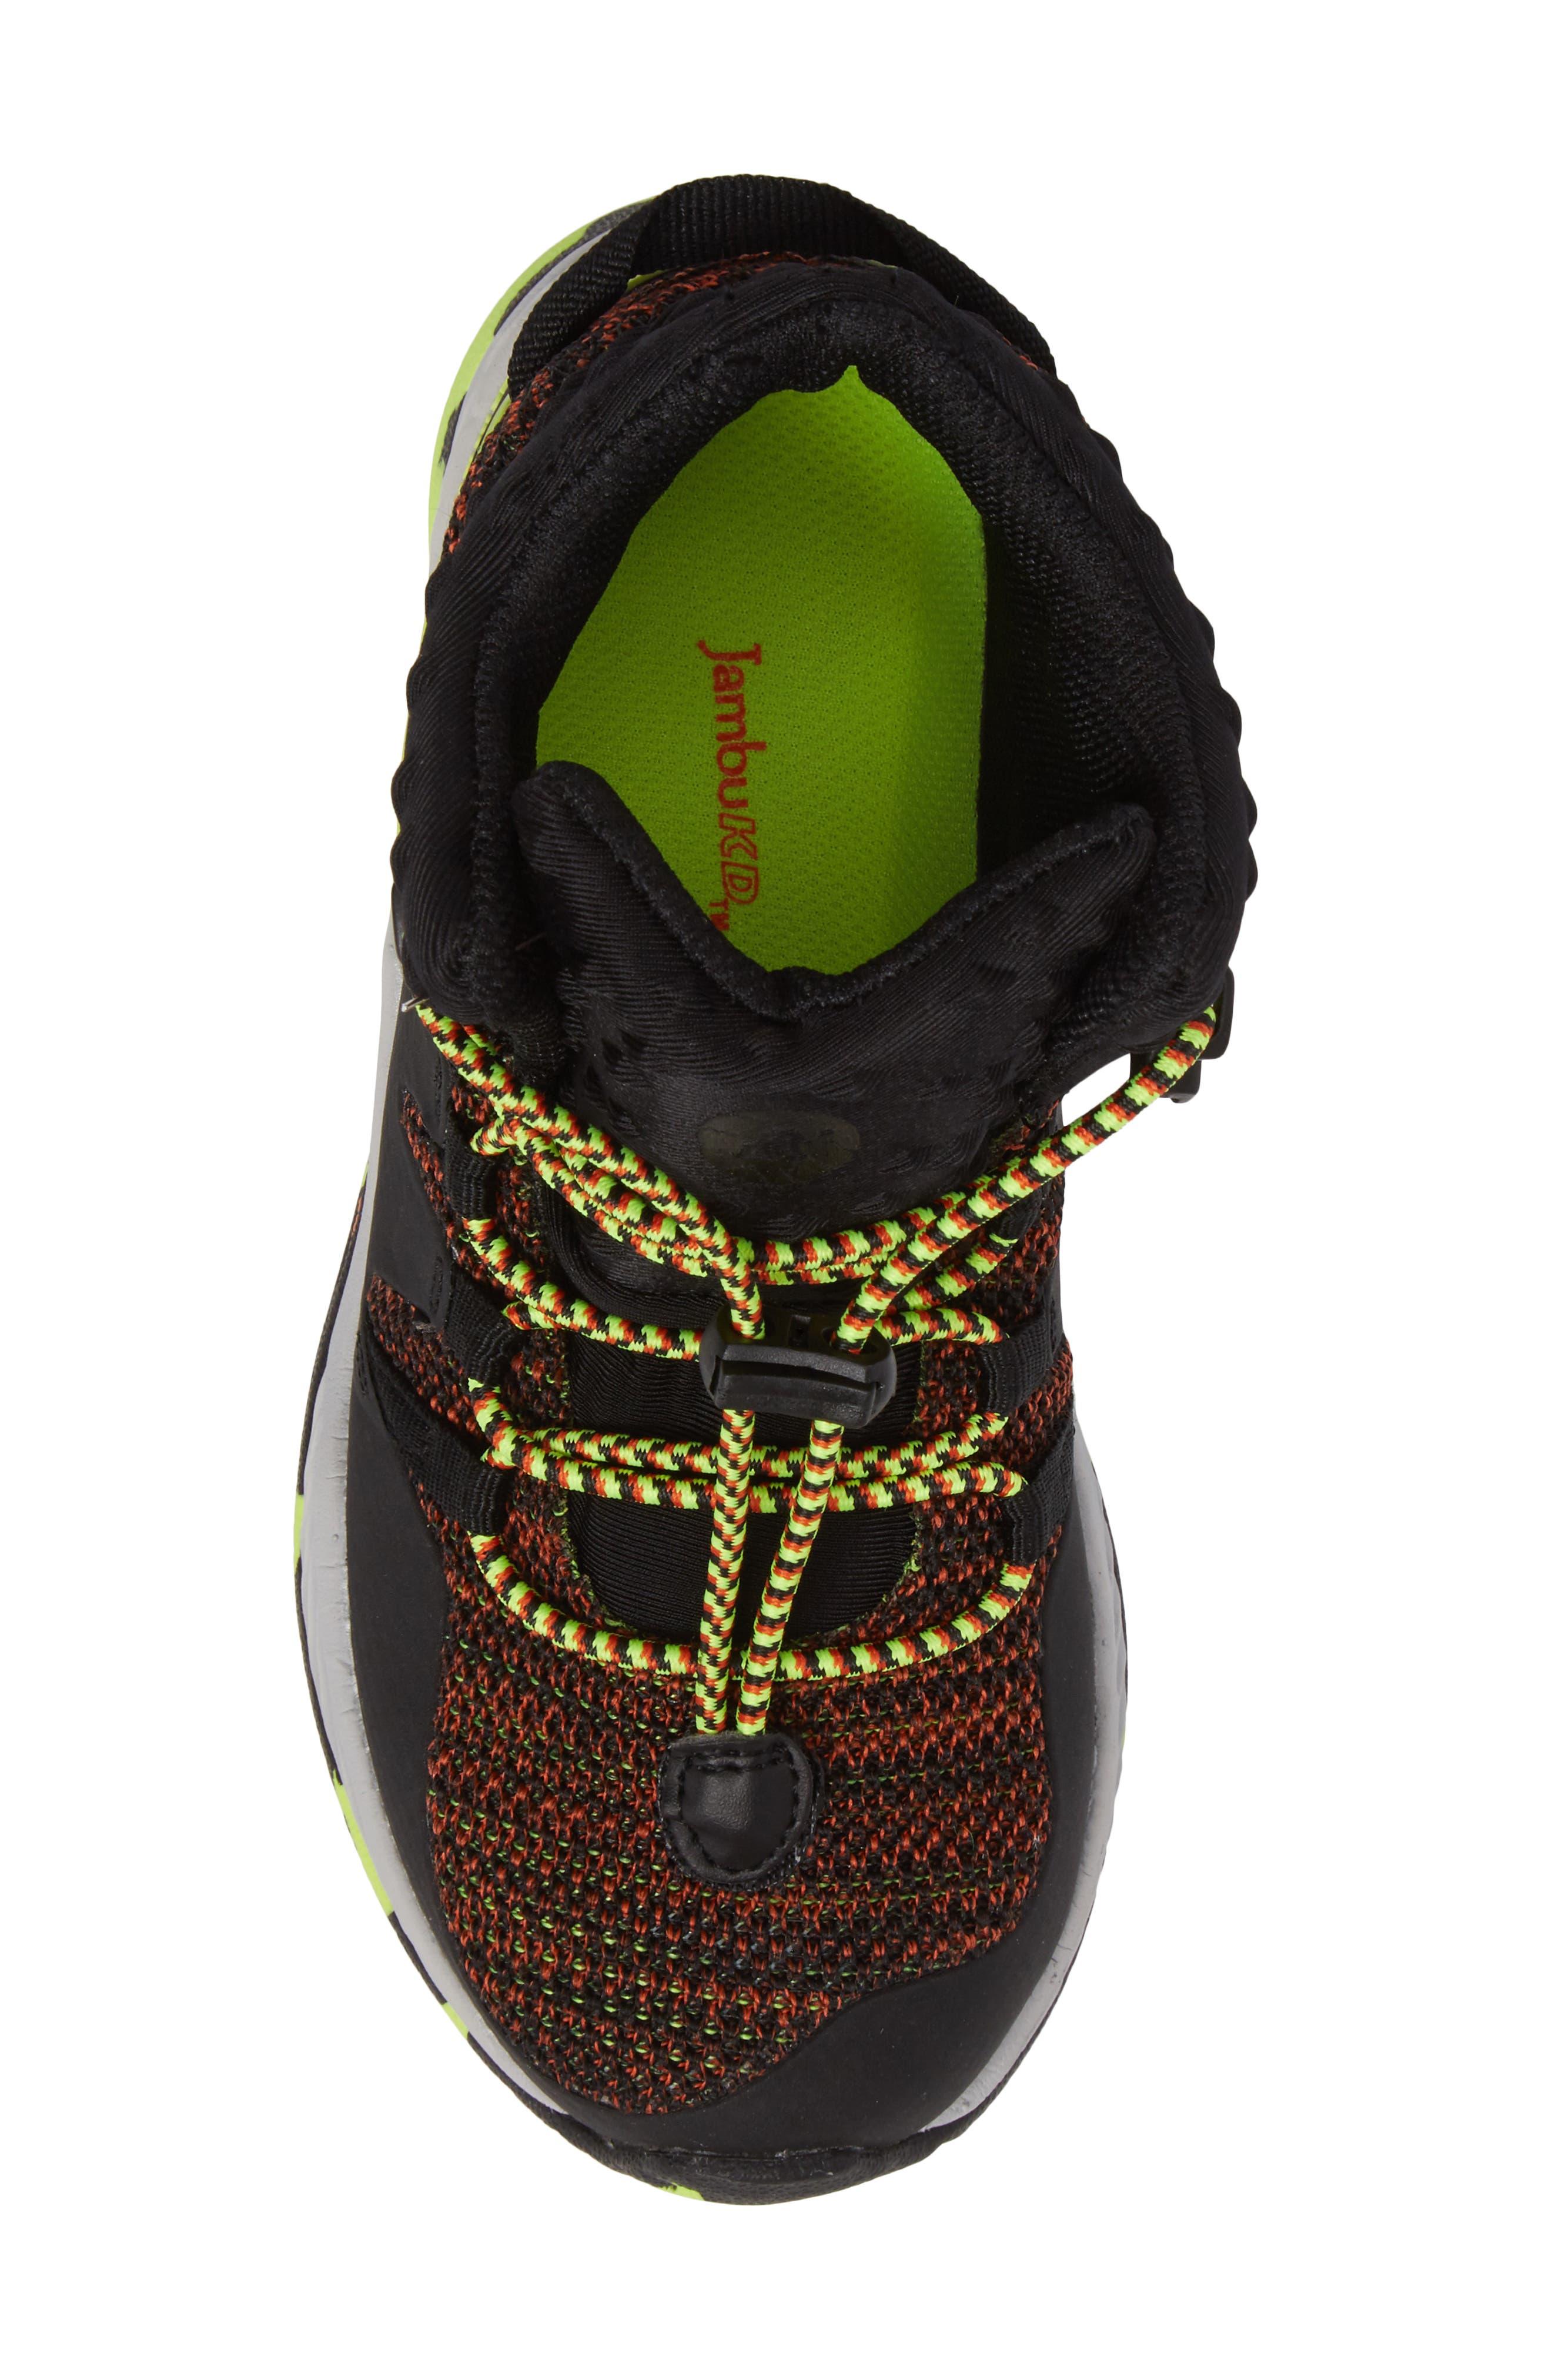 Armadillo Sneaker Boot,                             Alternate thumbnail 5, color,                             001